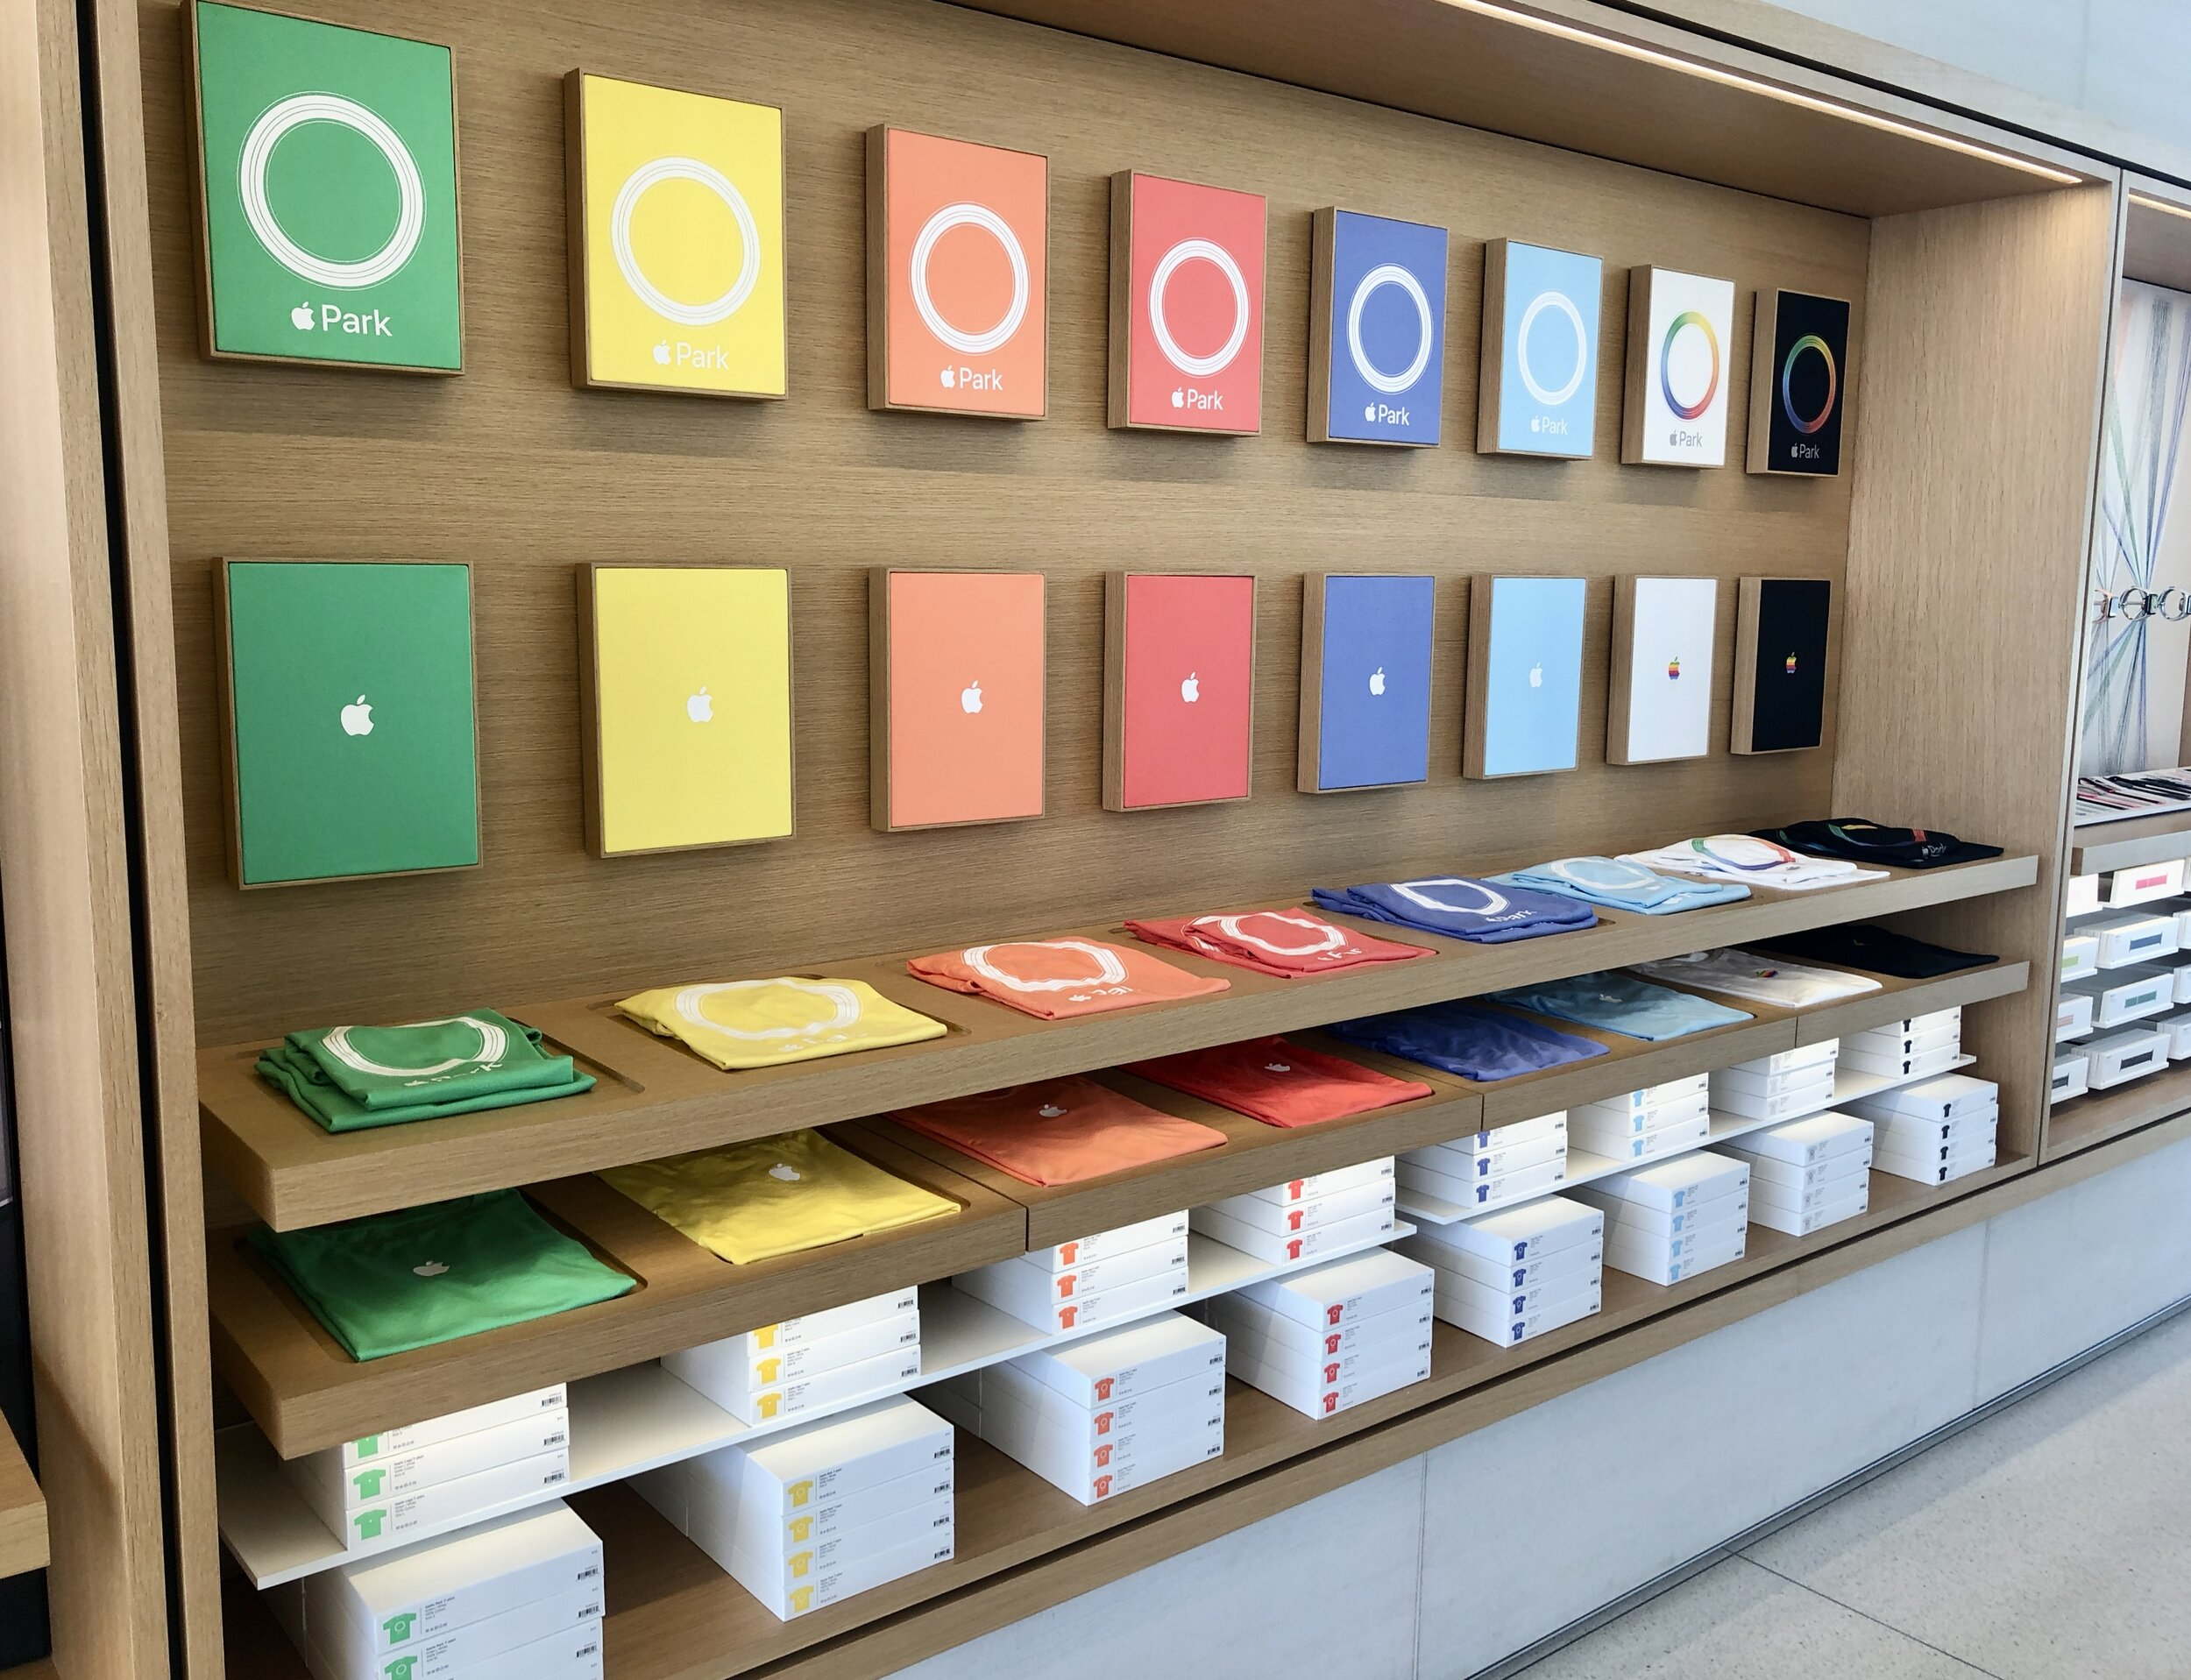 Apple Park Visitor Center — Dené Schunck